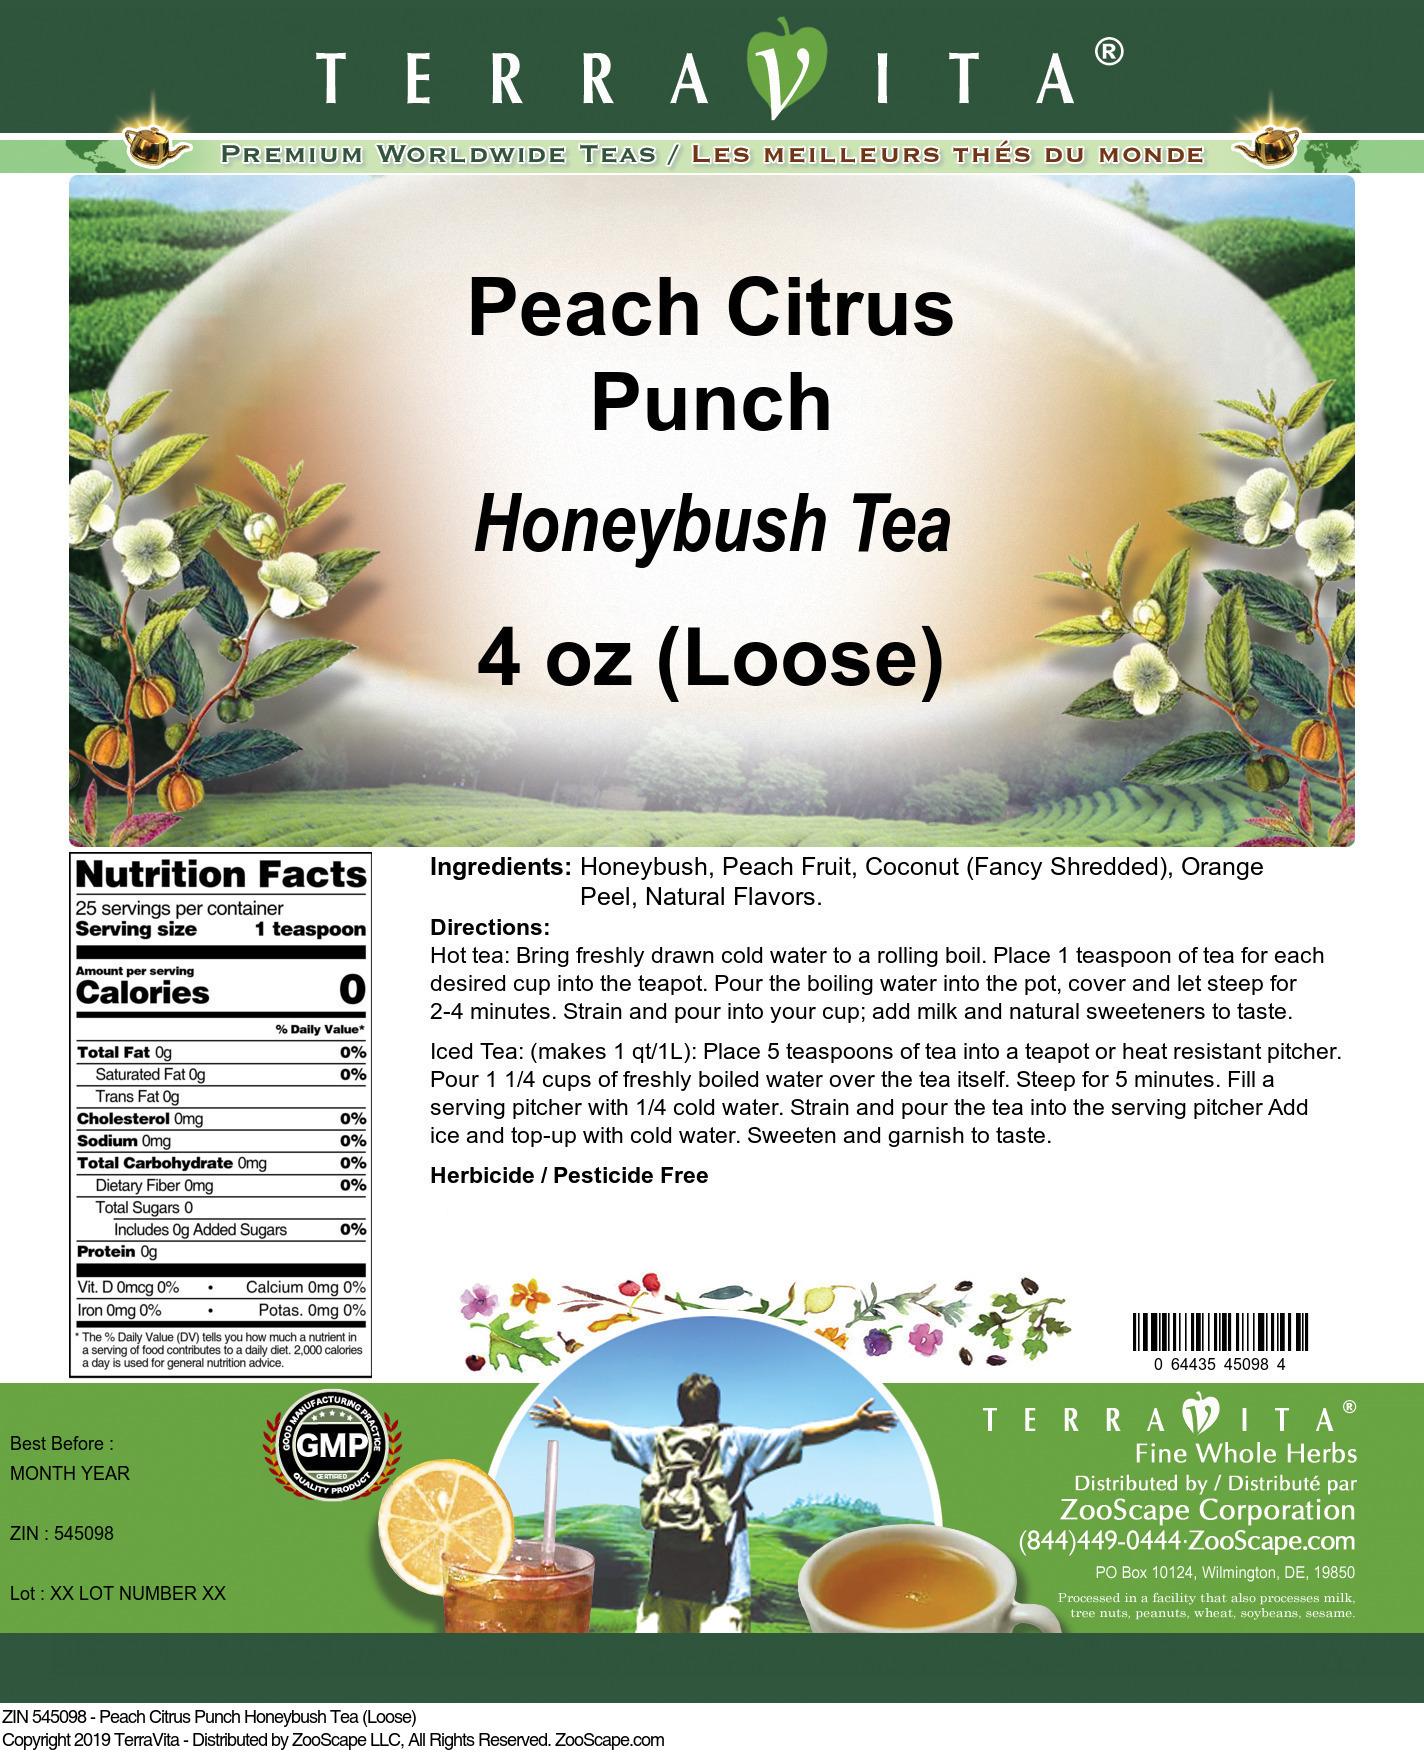 Peach Citrus Punch Honeybush Tea (Loose)